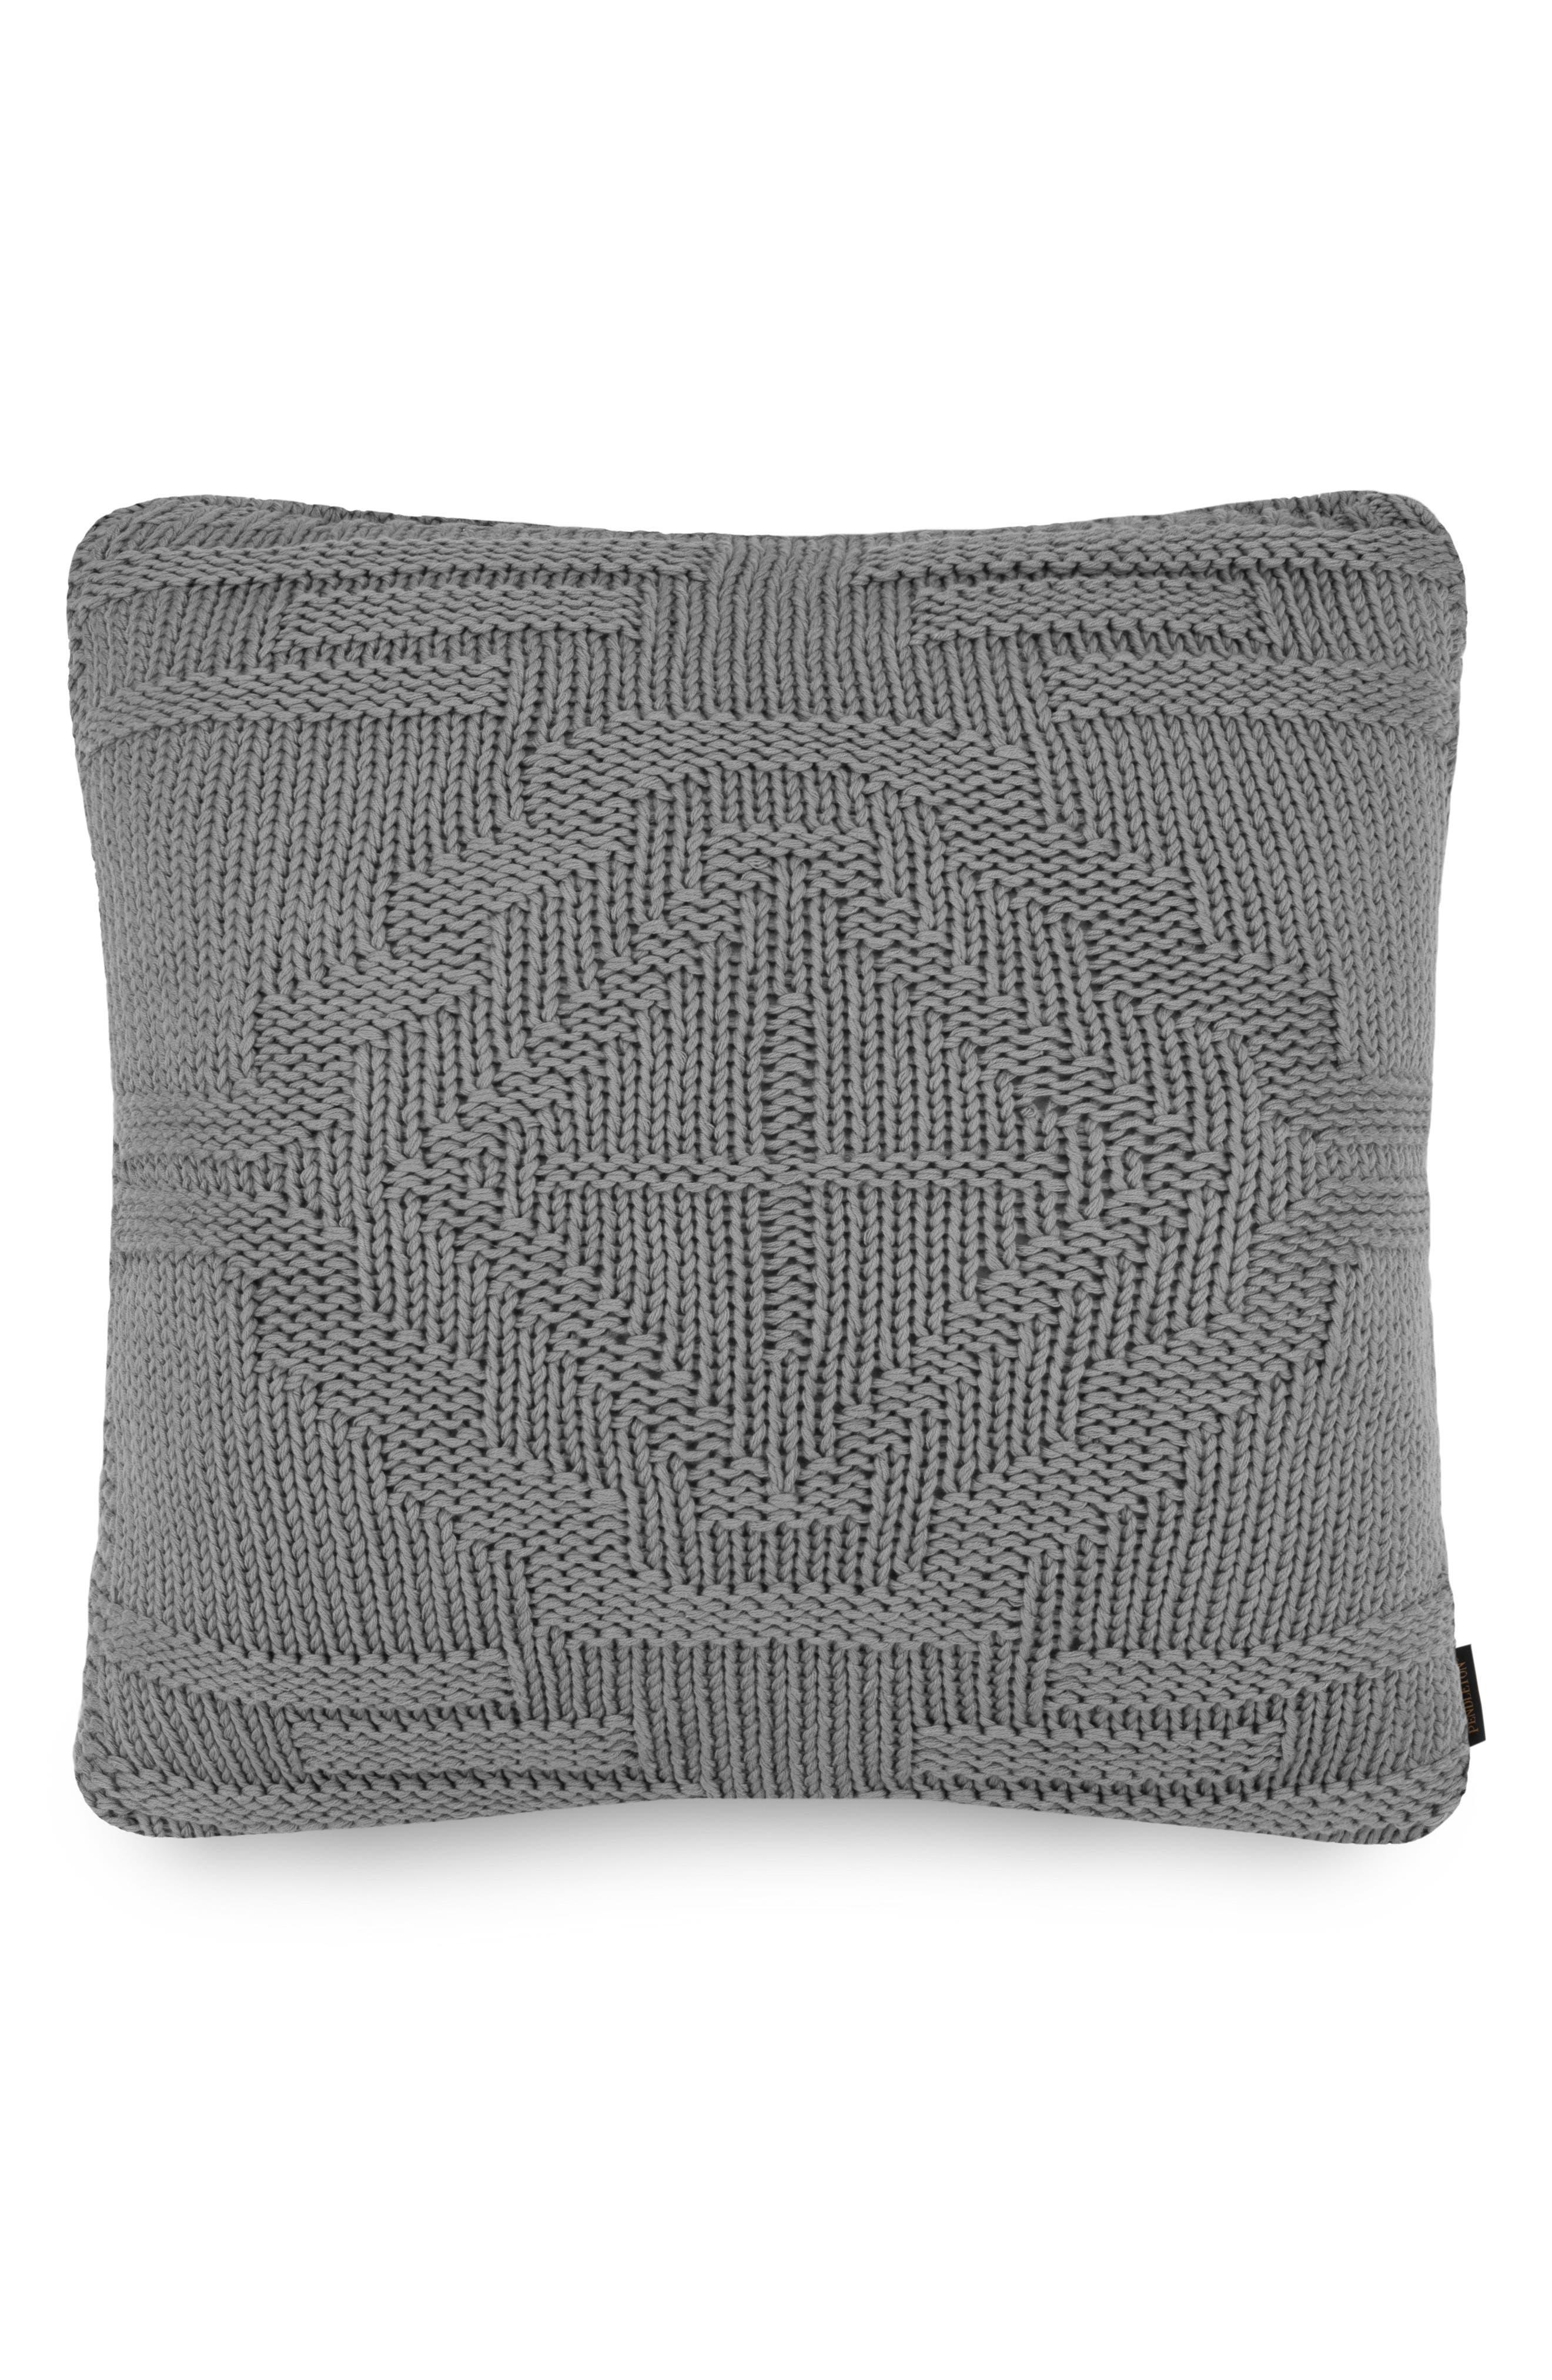 Santa Clara Pillow,                         Main,                         color, 020